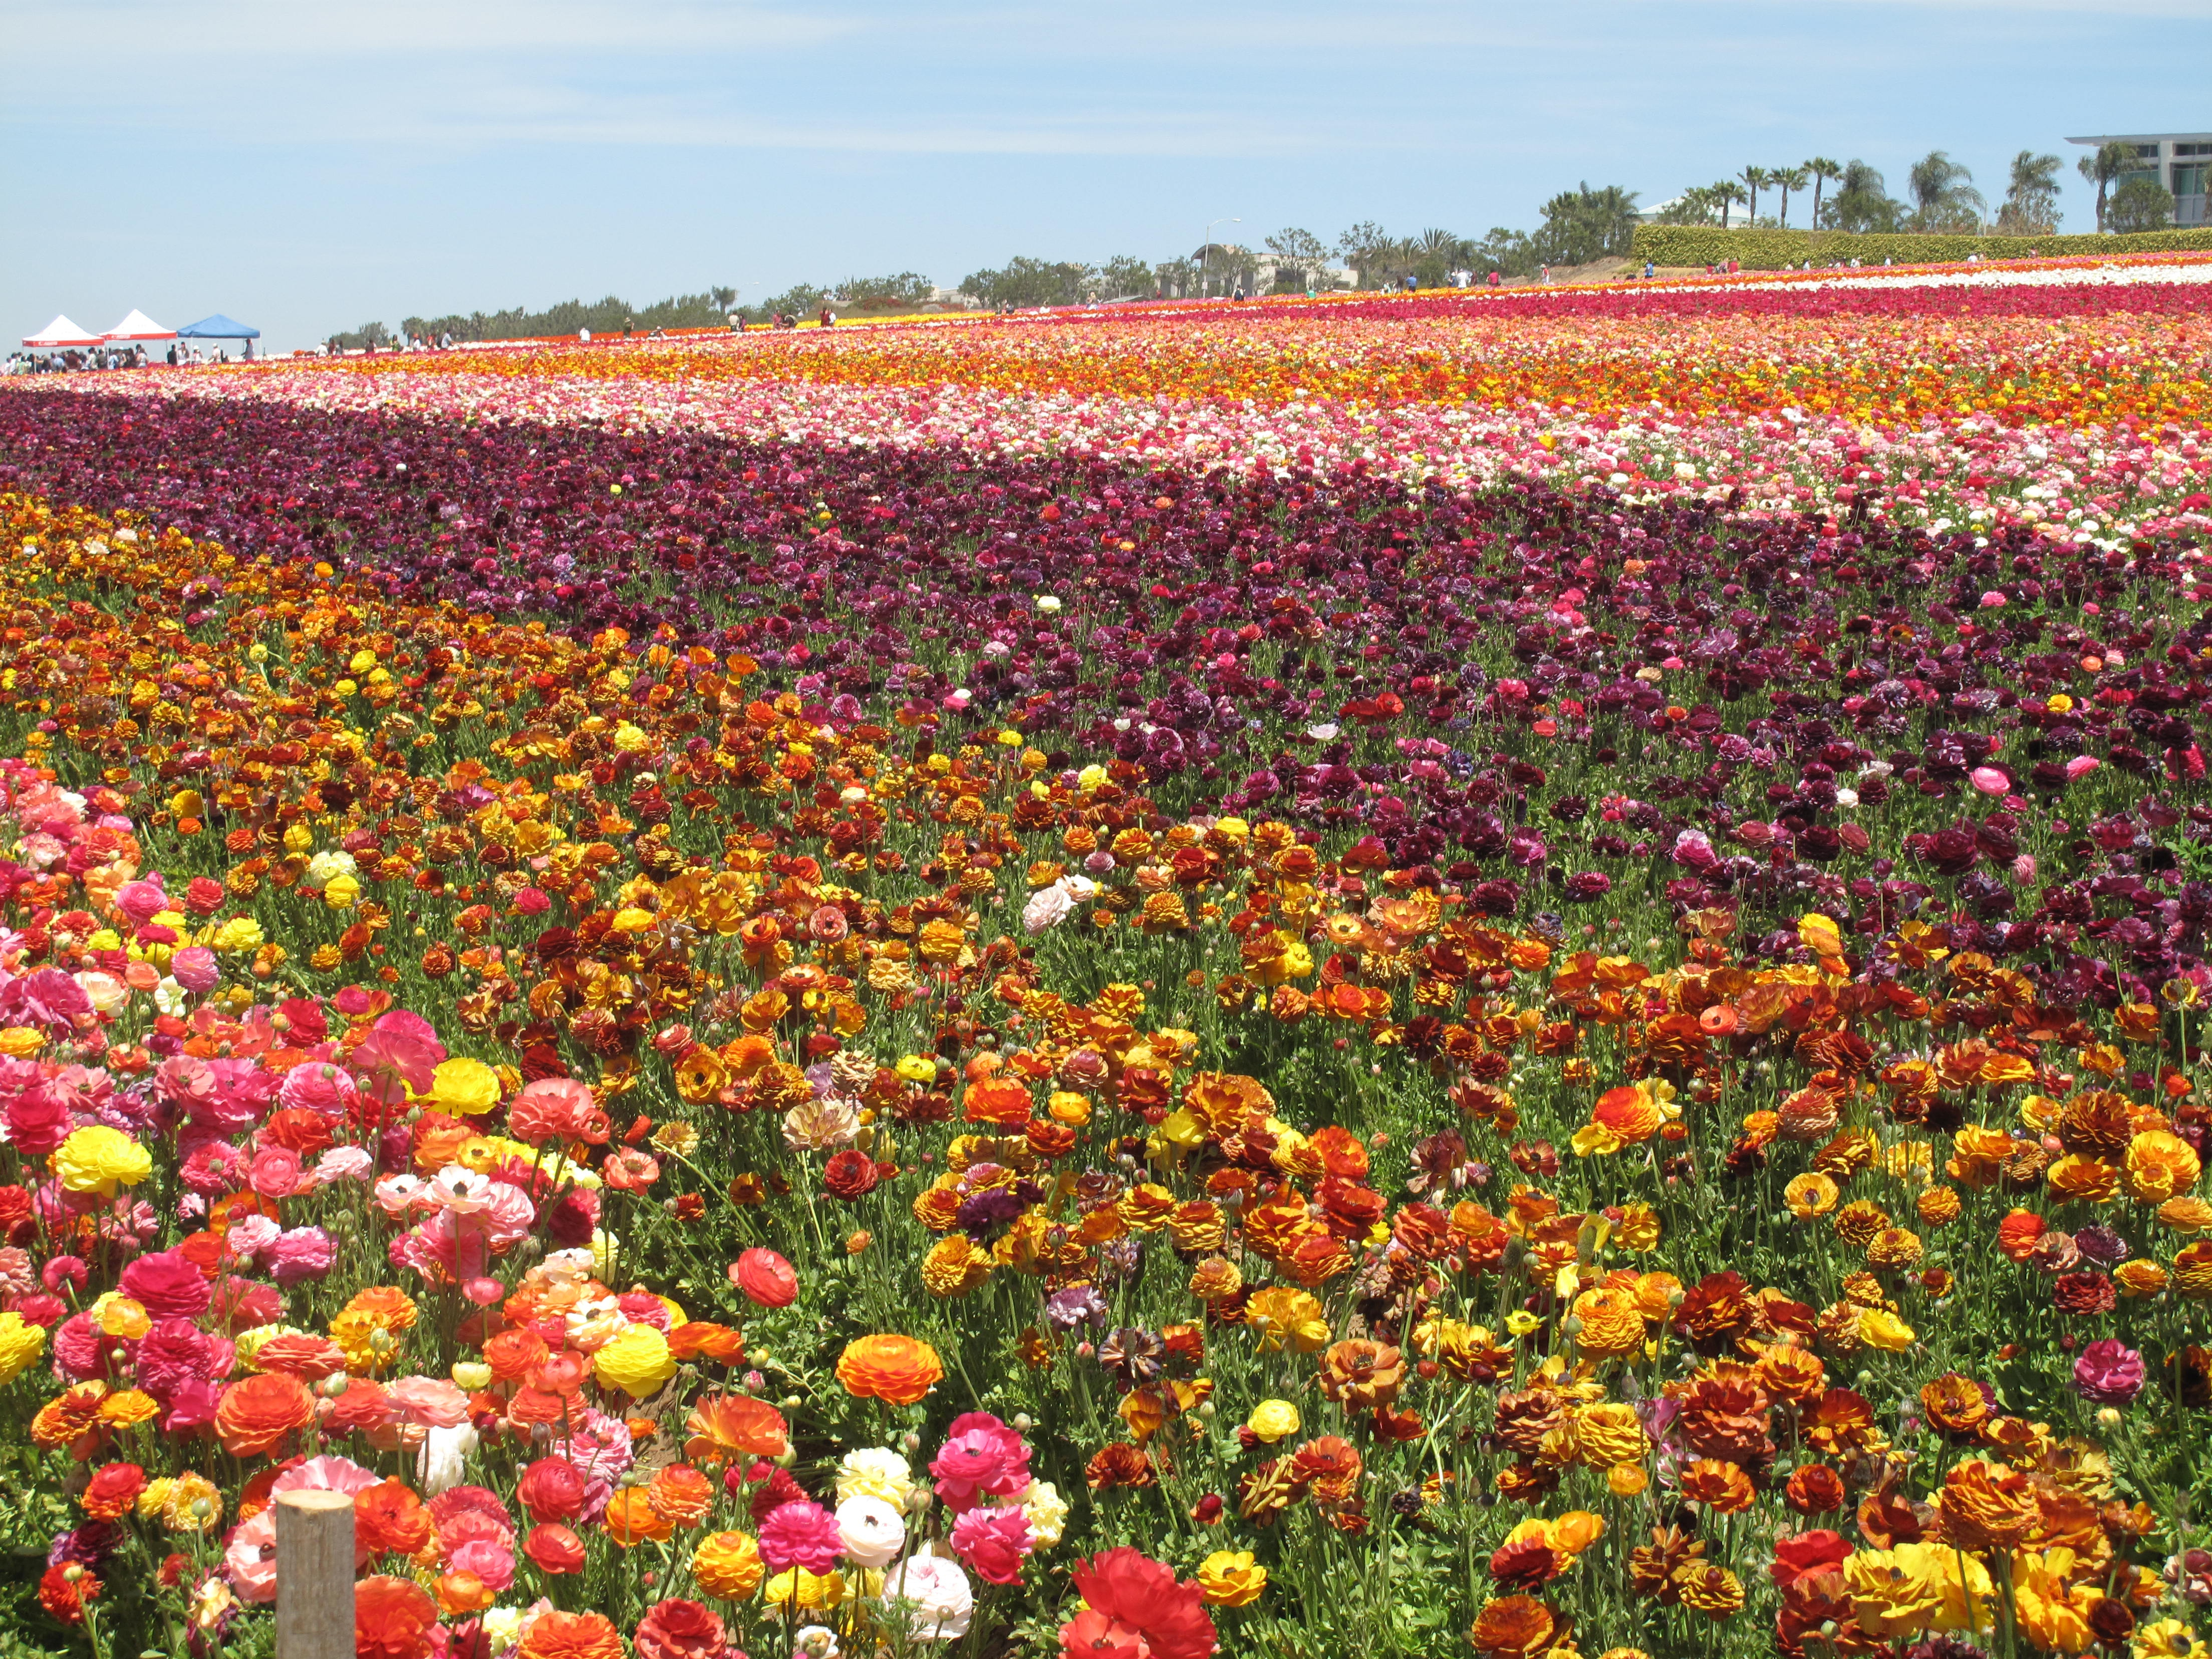 Flower Fields Wallpapers s Backgrounds